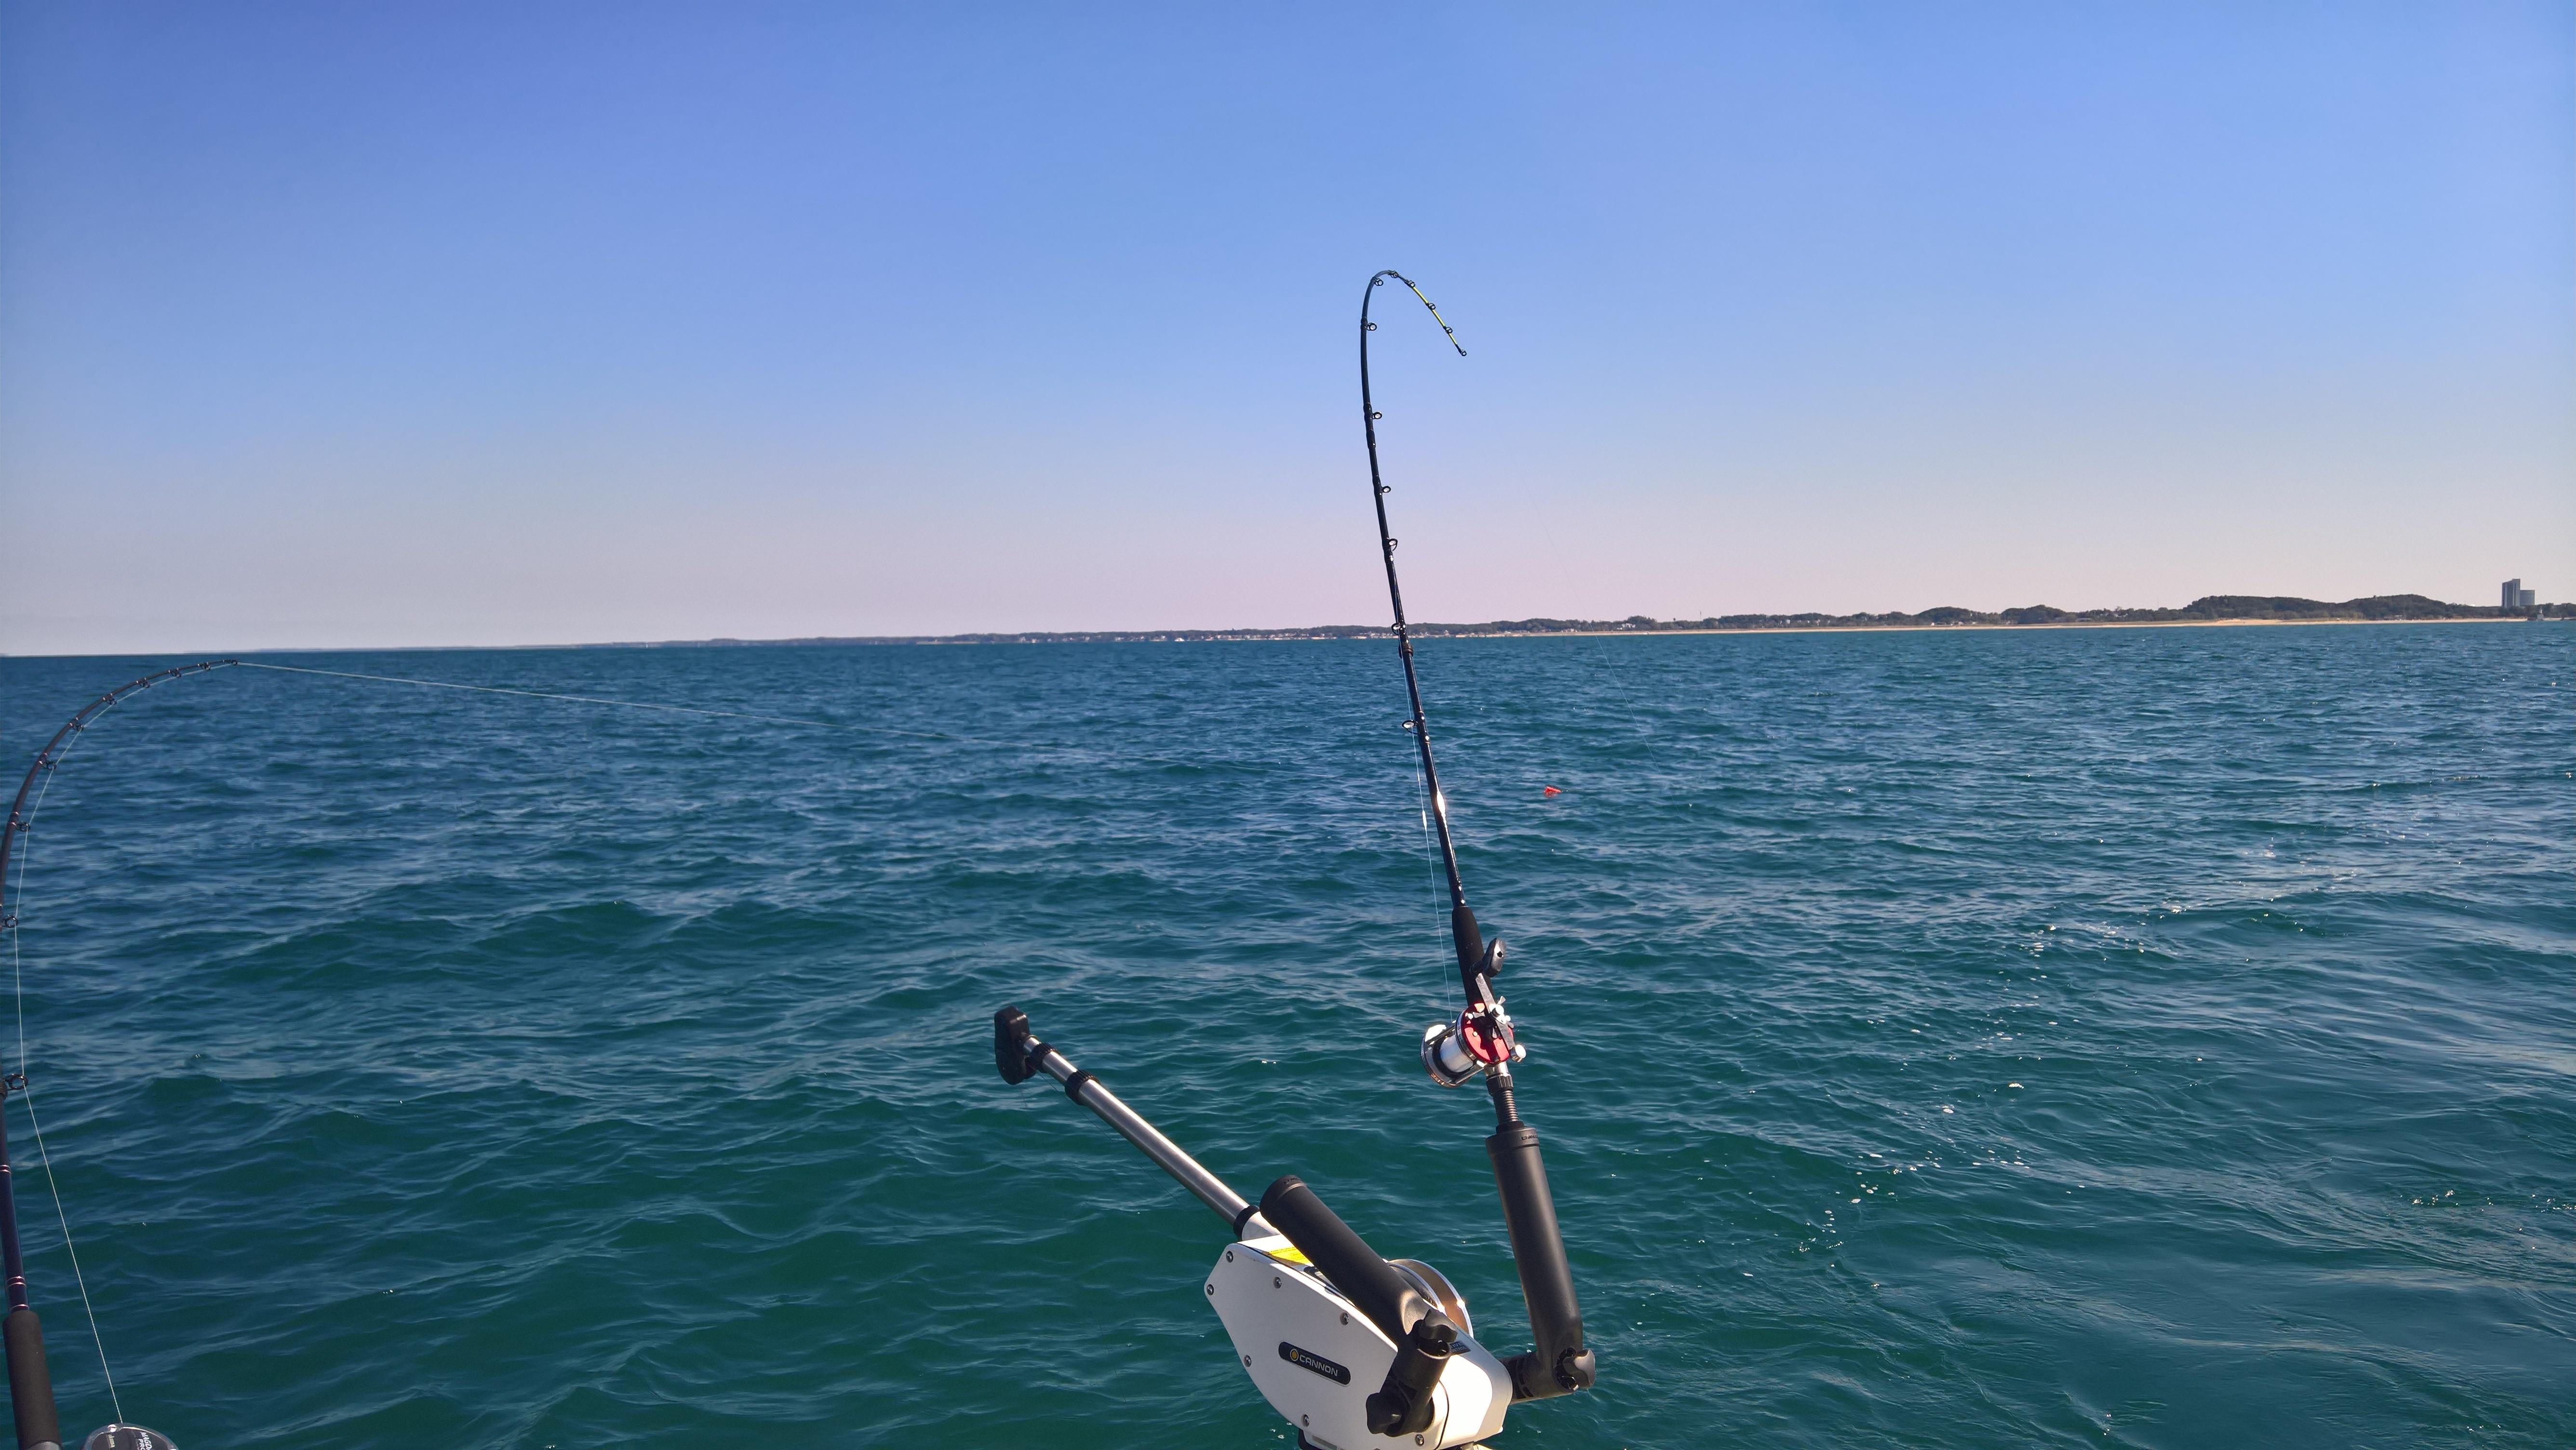 Scoffer great lakes fisherman trout salmon walleye for Fishing lake michigan